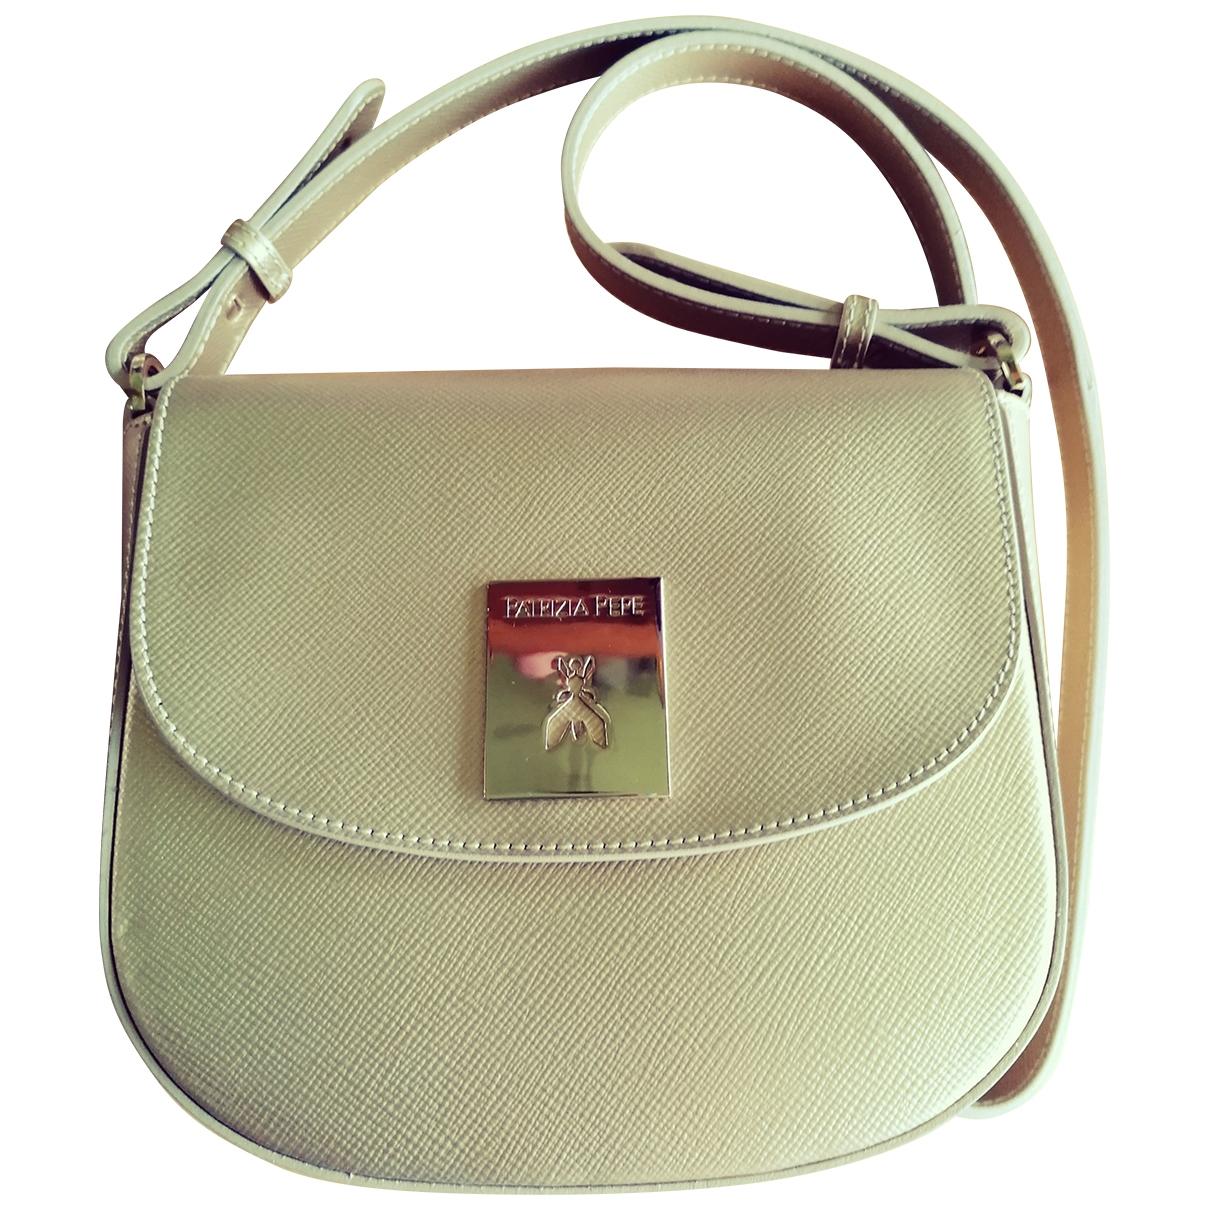 Patrizia Pepe \N Gold Leather handbag for Women \N